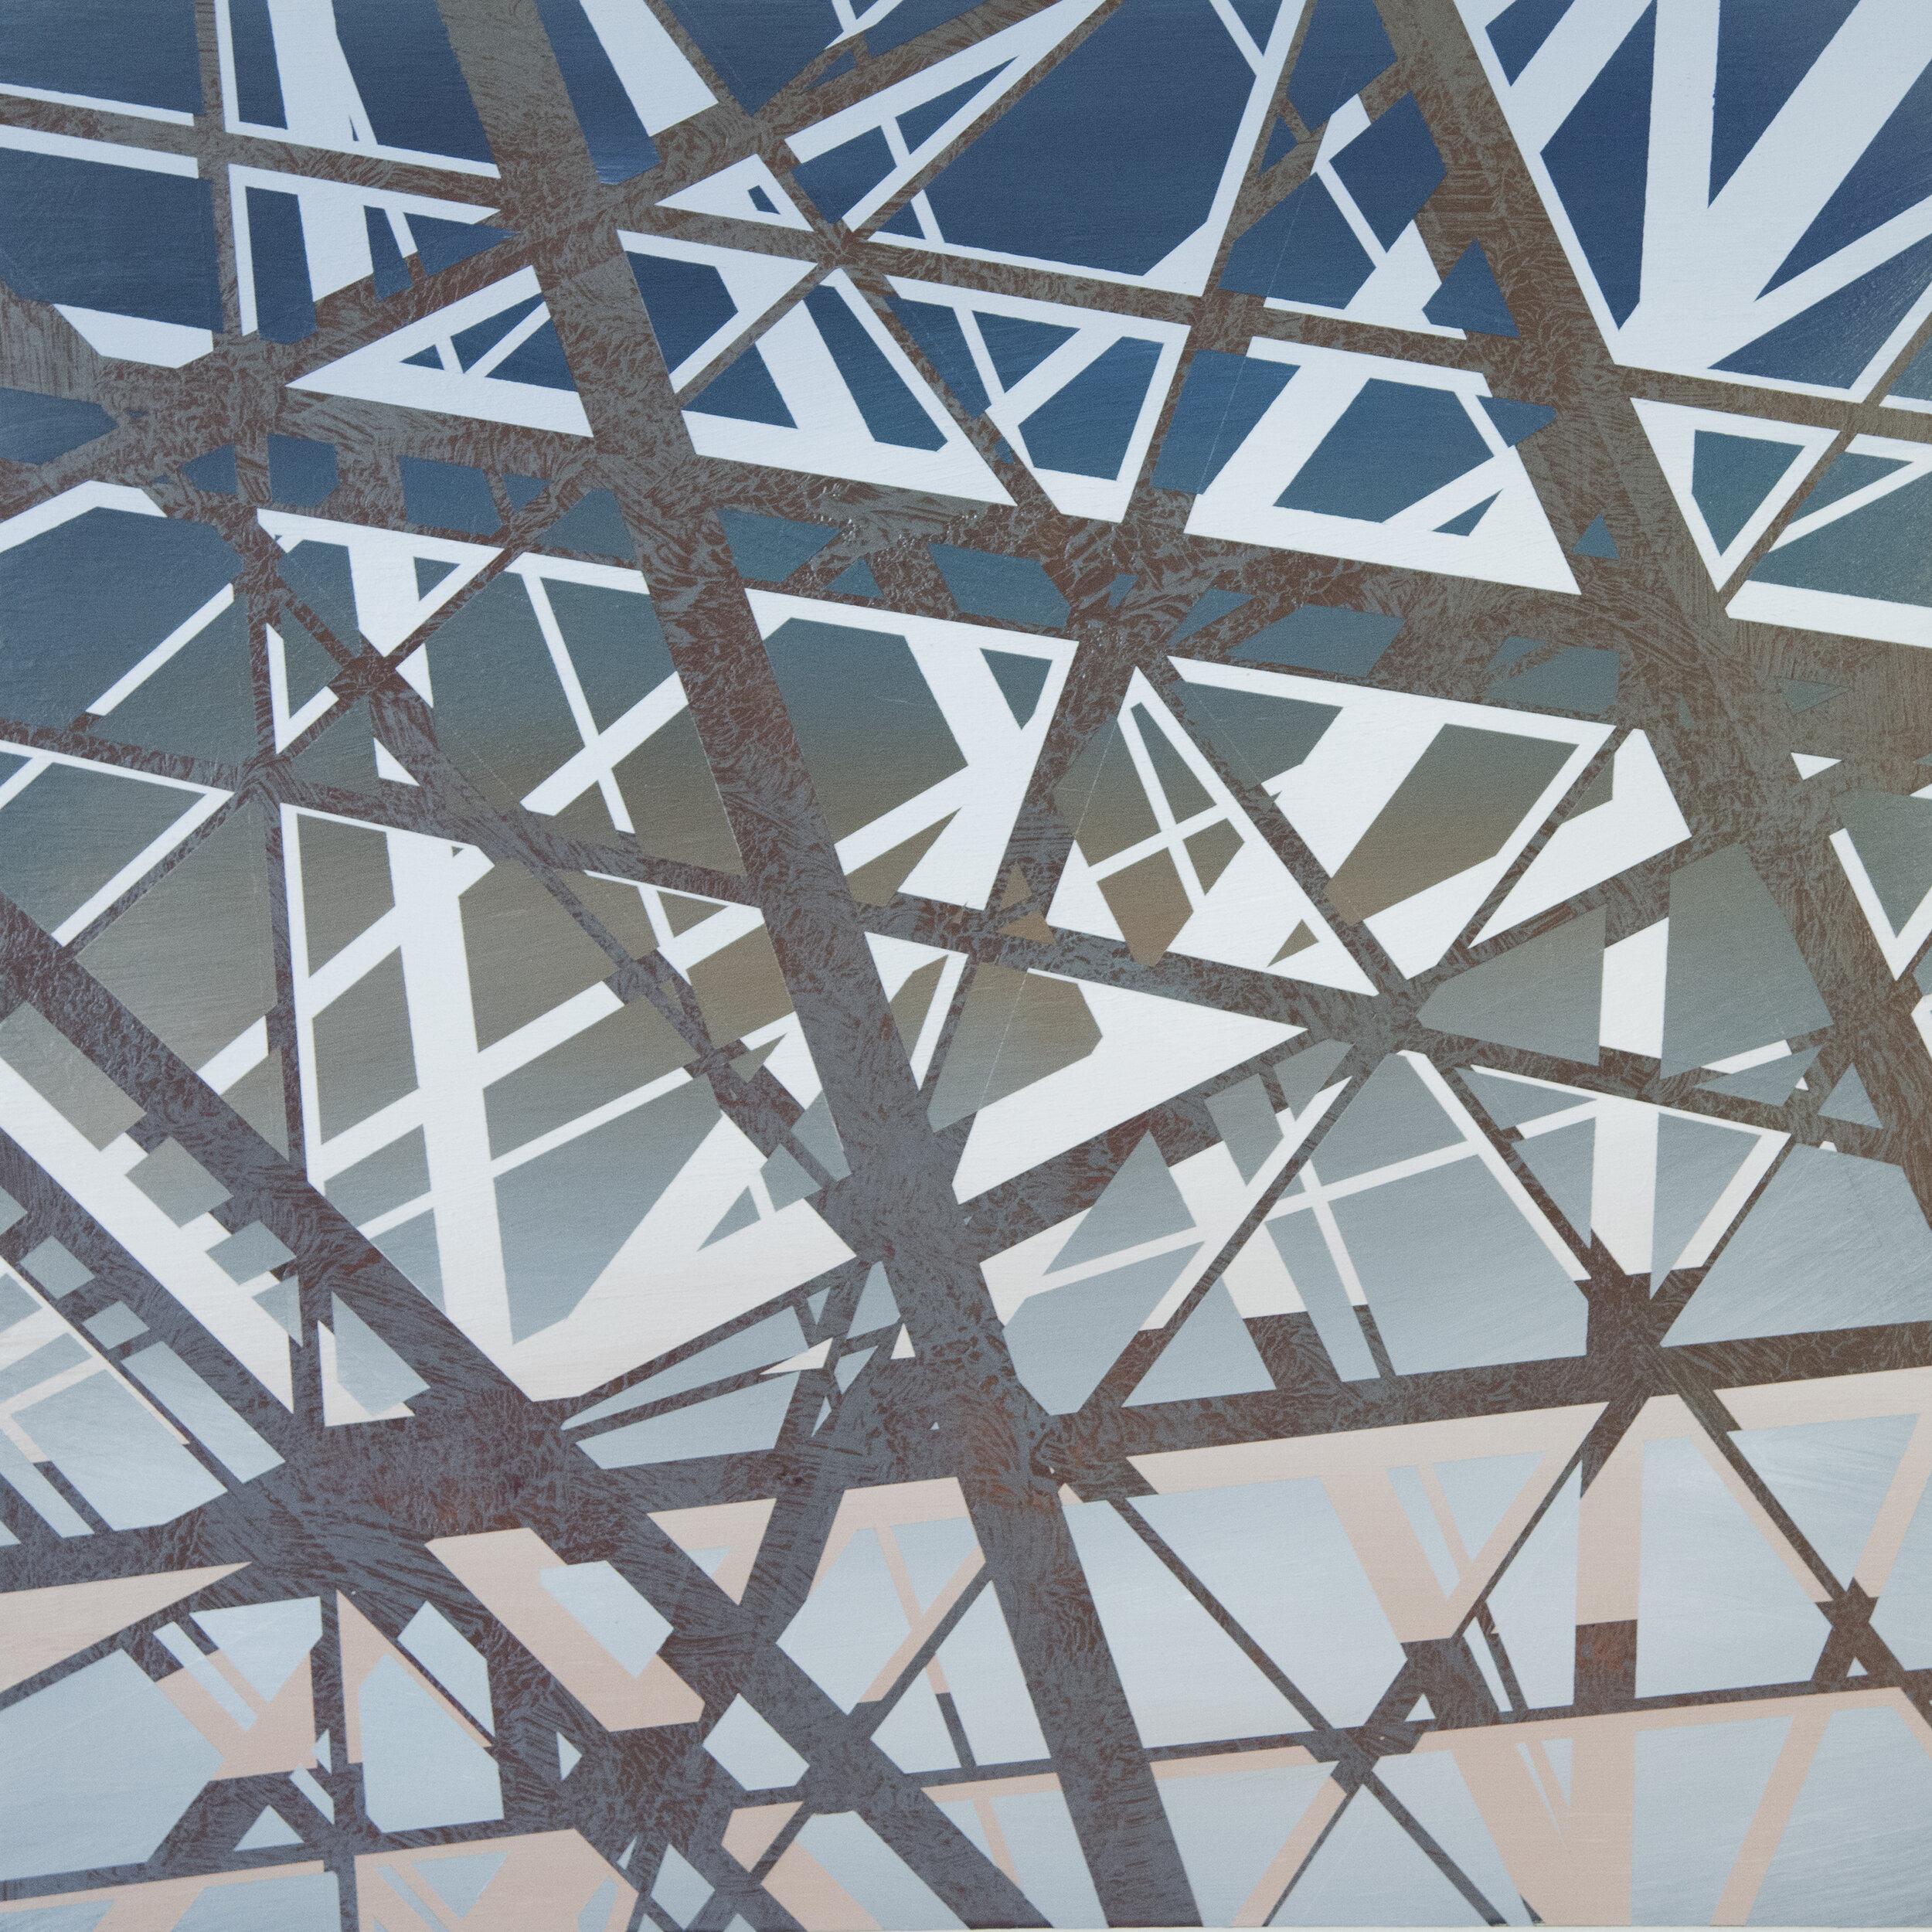 Daniel_Stuelpnagel-_Stone_At_Rain_Relents_-30x30_-acryliconwoodpanel-2019-$550.jpg